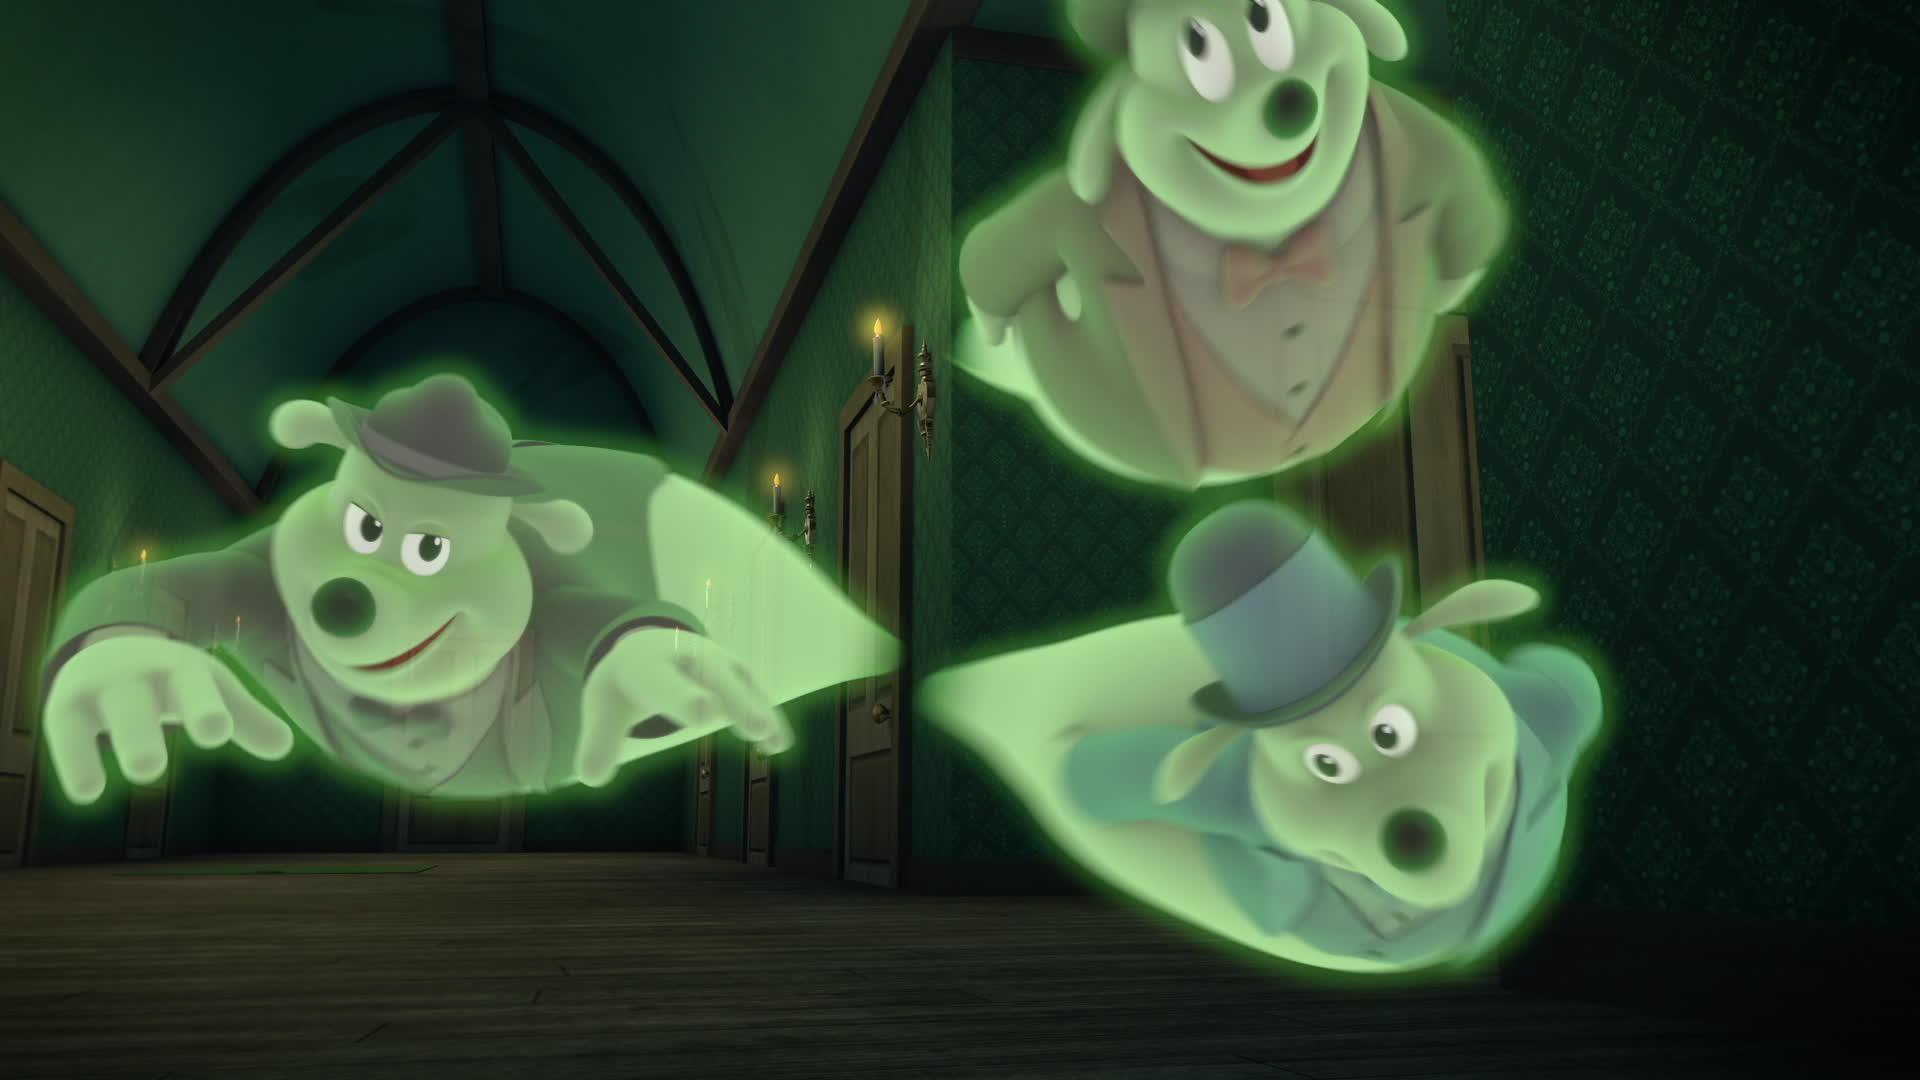 Music Video: Creepy Creeps